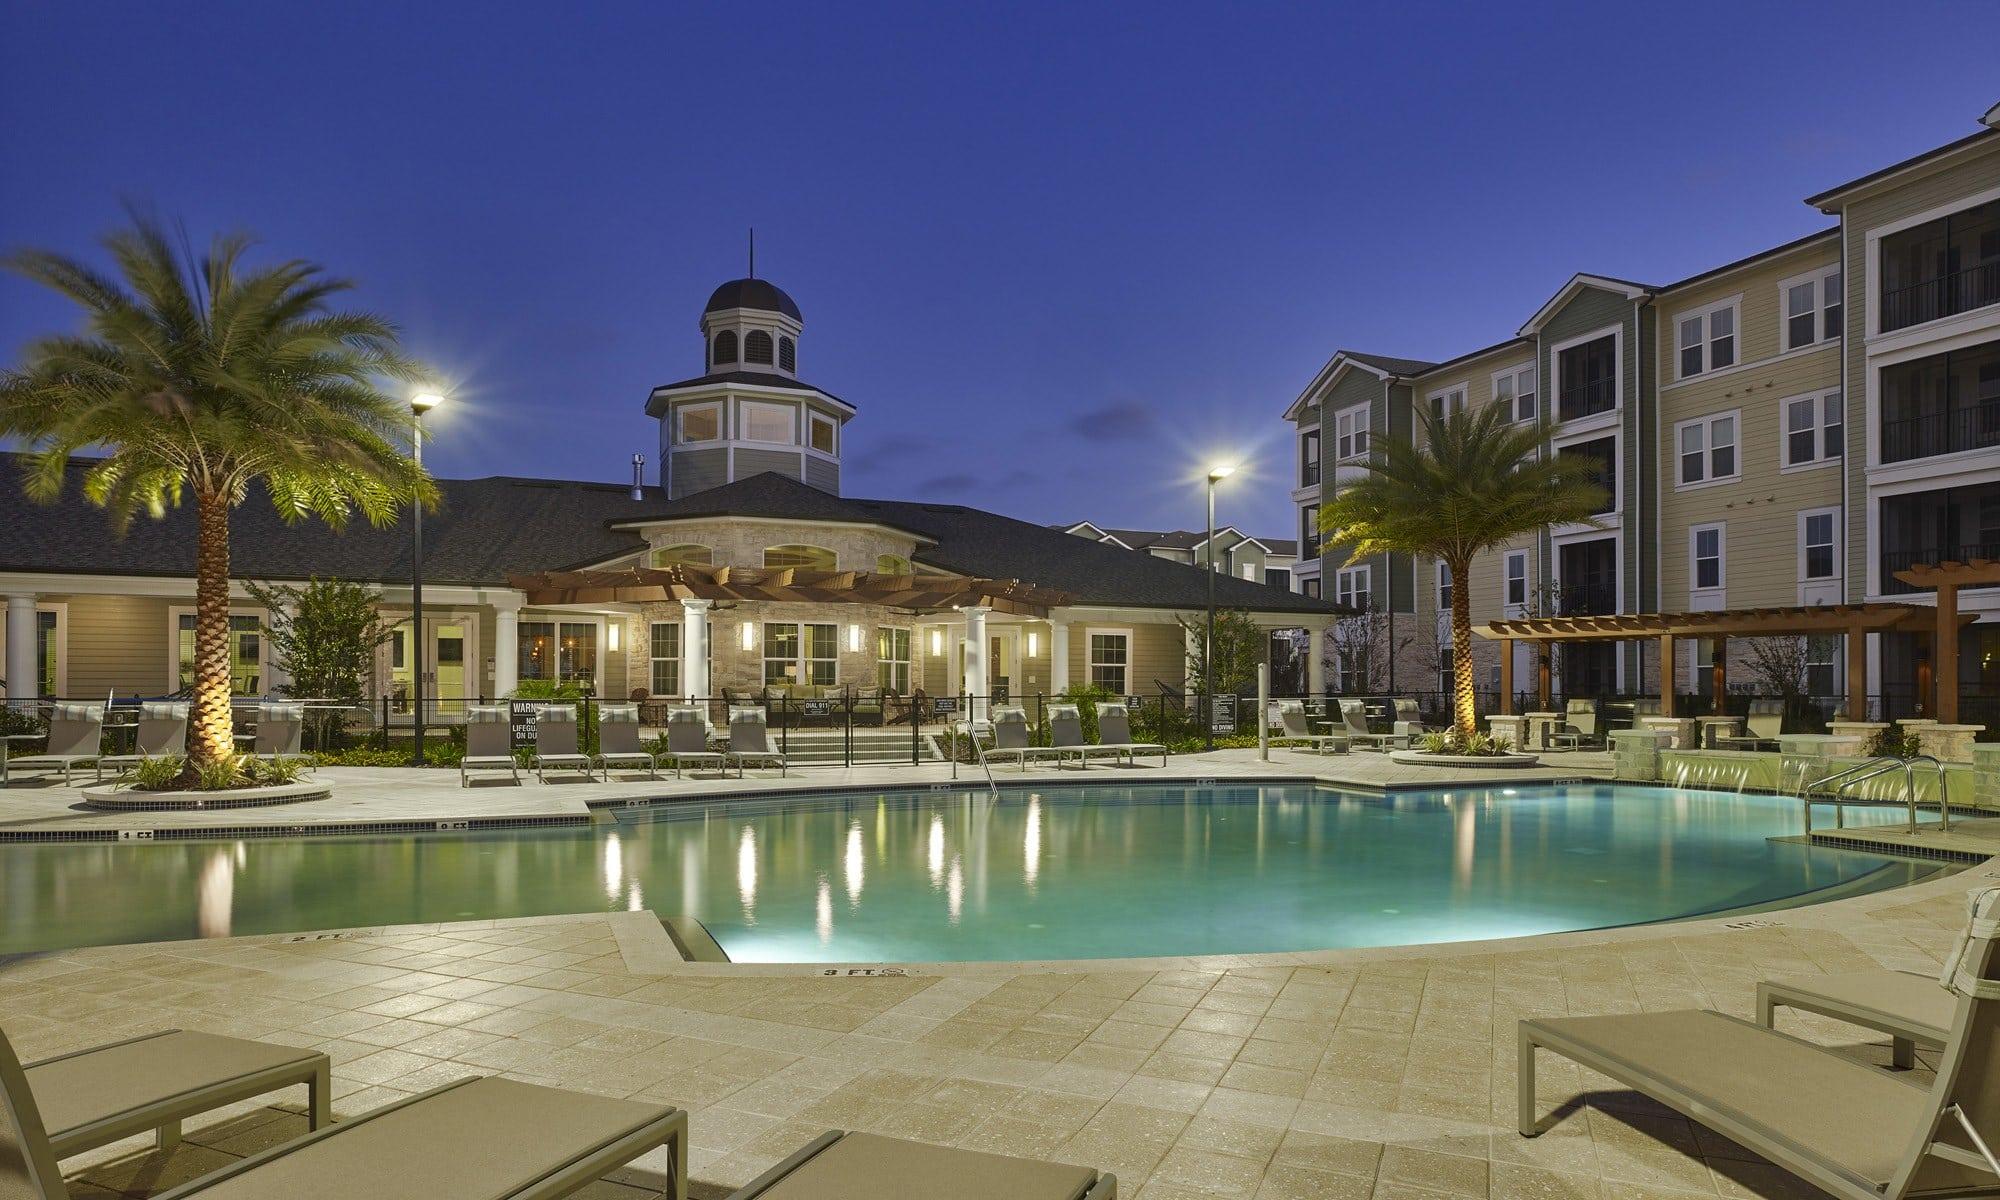 Apartments in Odessa, FL